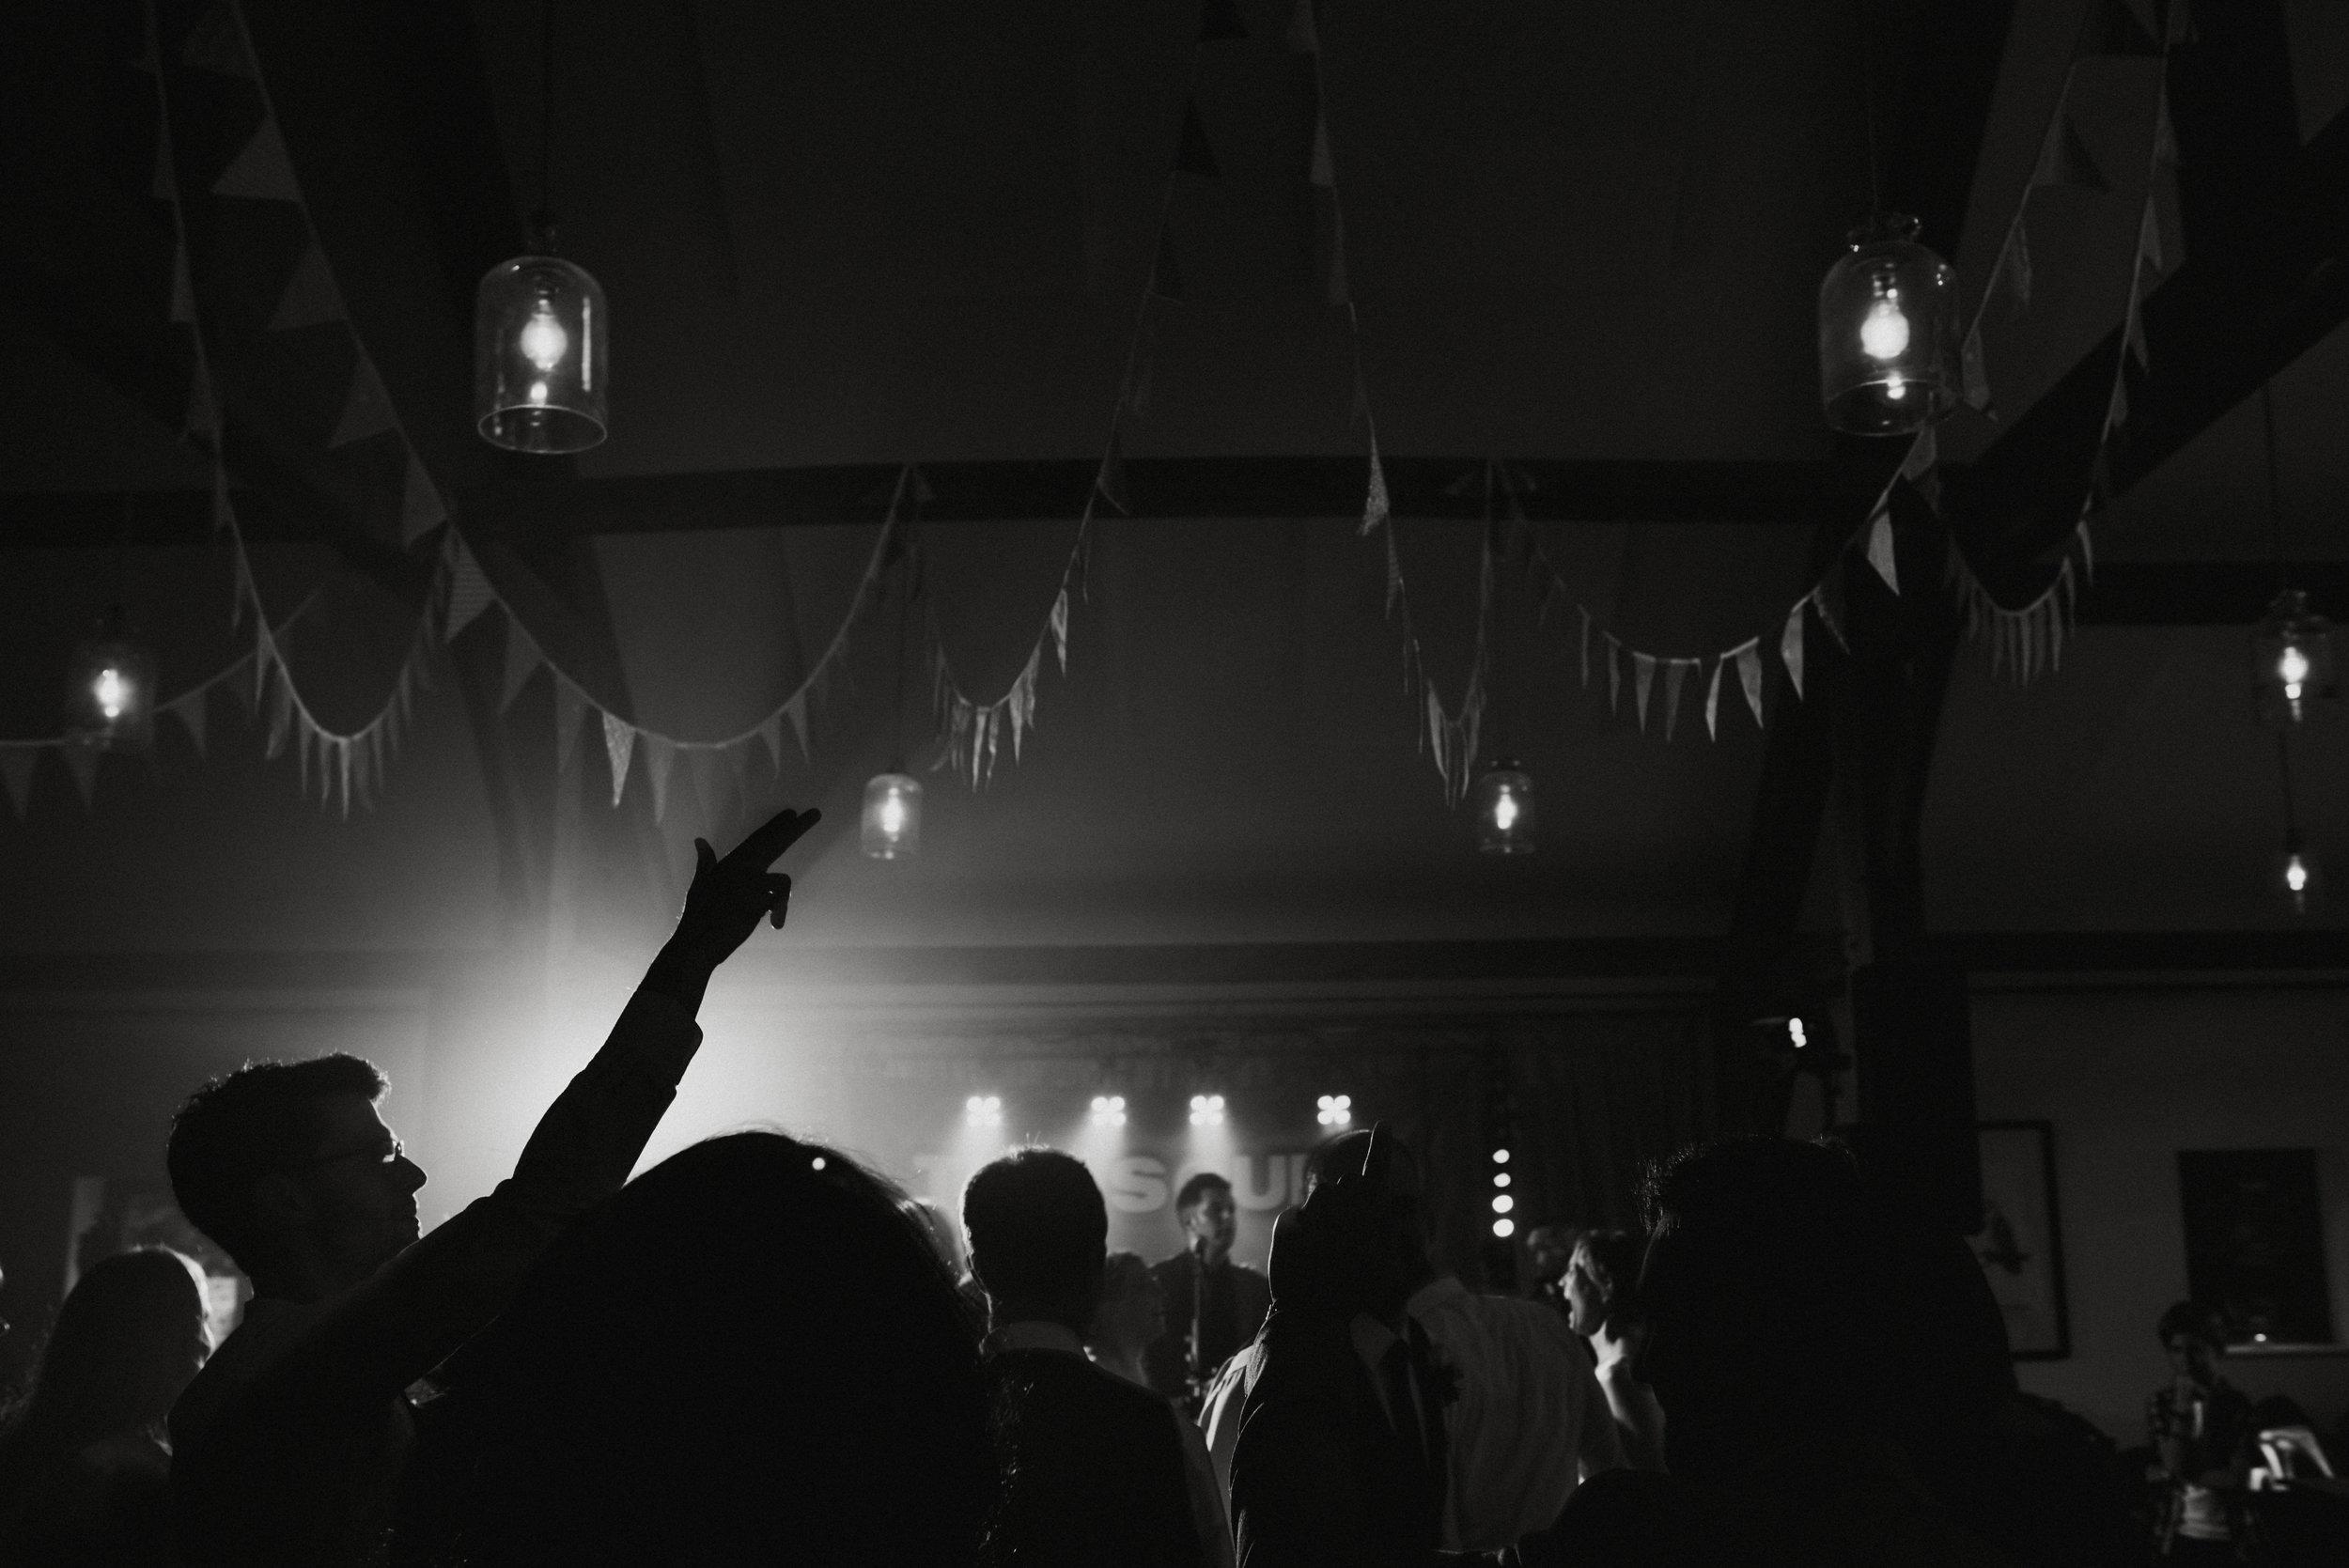 wedding-photographer-nancarrow-63.jpg